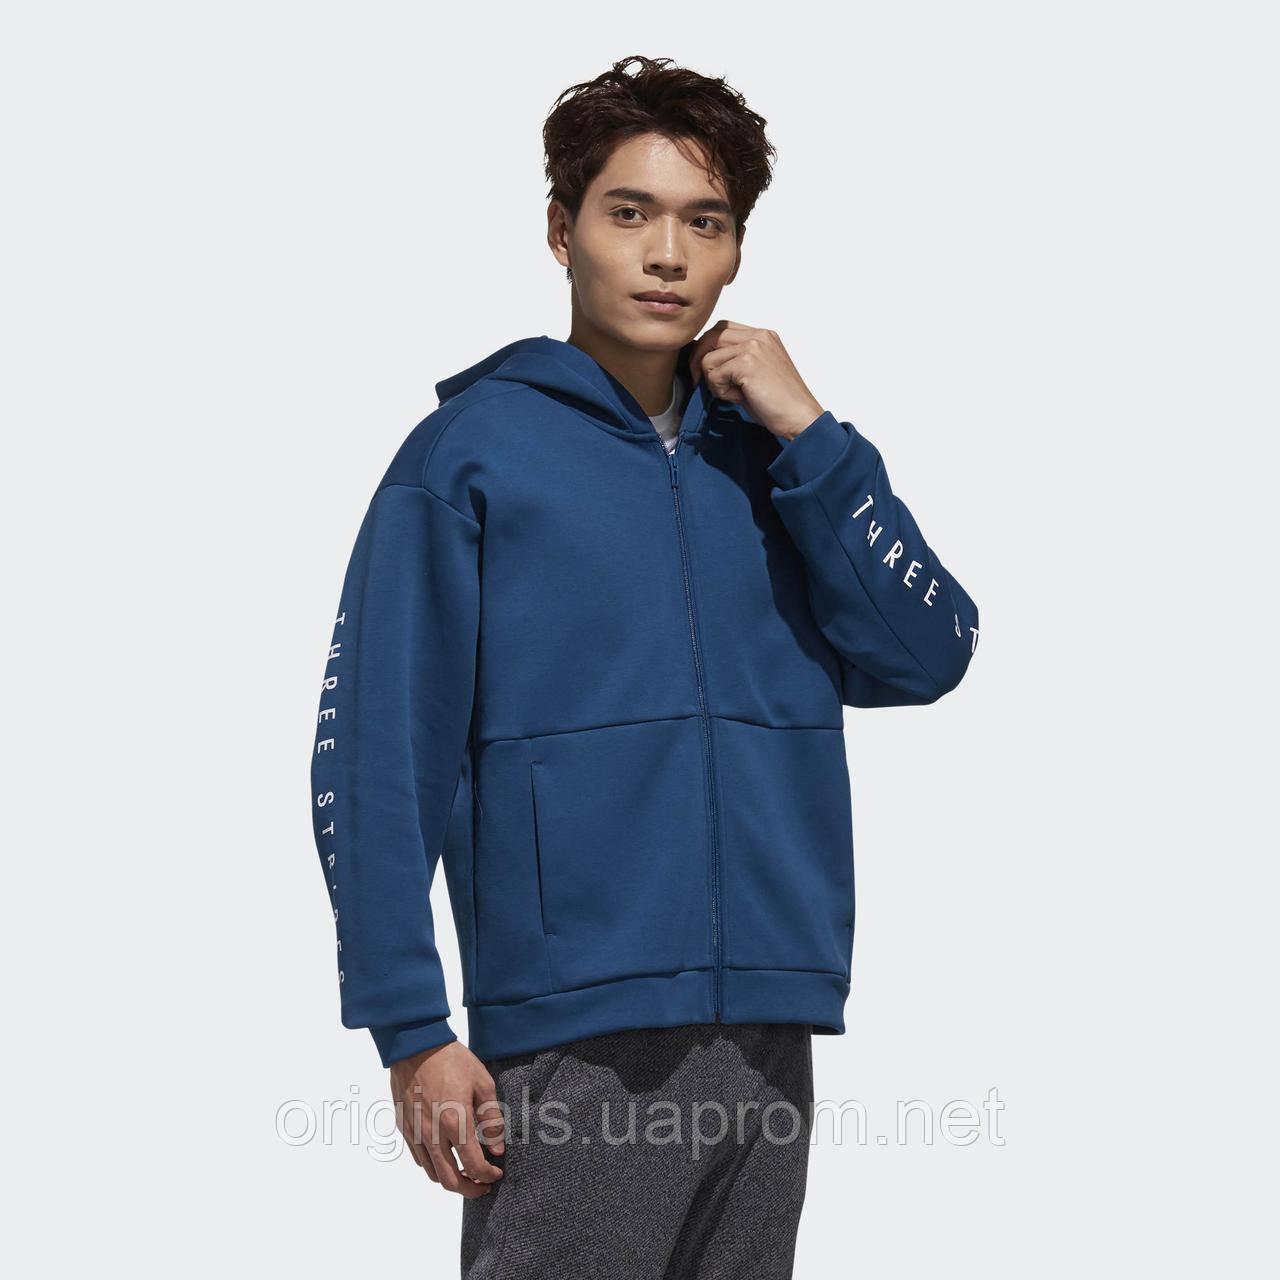 Мужская толстовка Adidas Sport 2 Street Knit DV3338